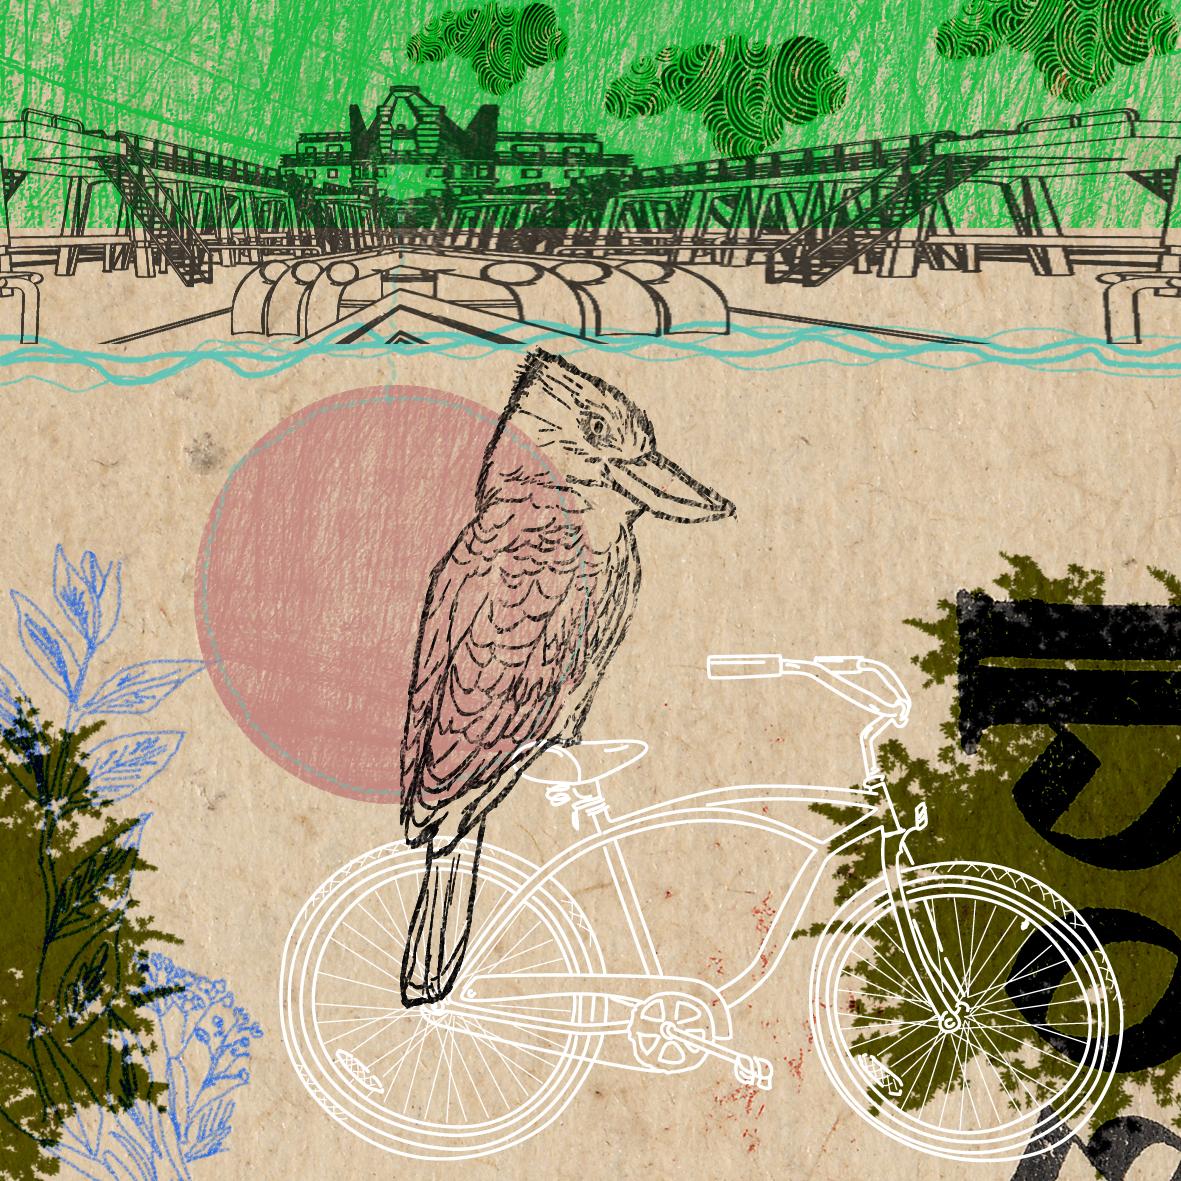 Vogel-fährt-Rad-10x10